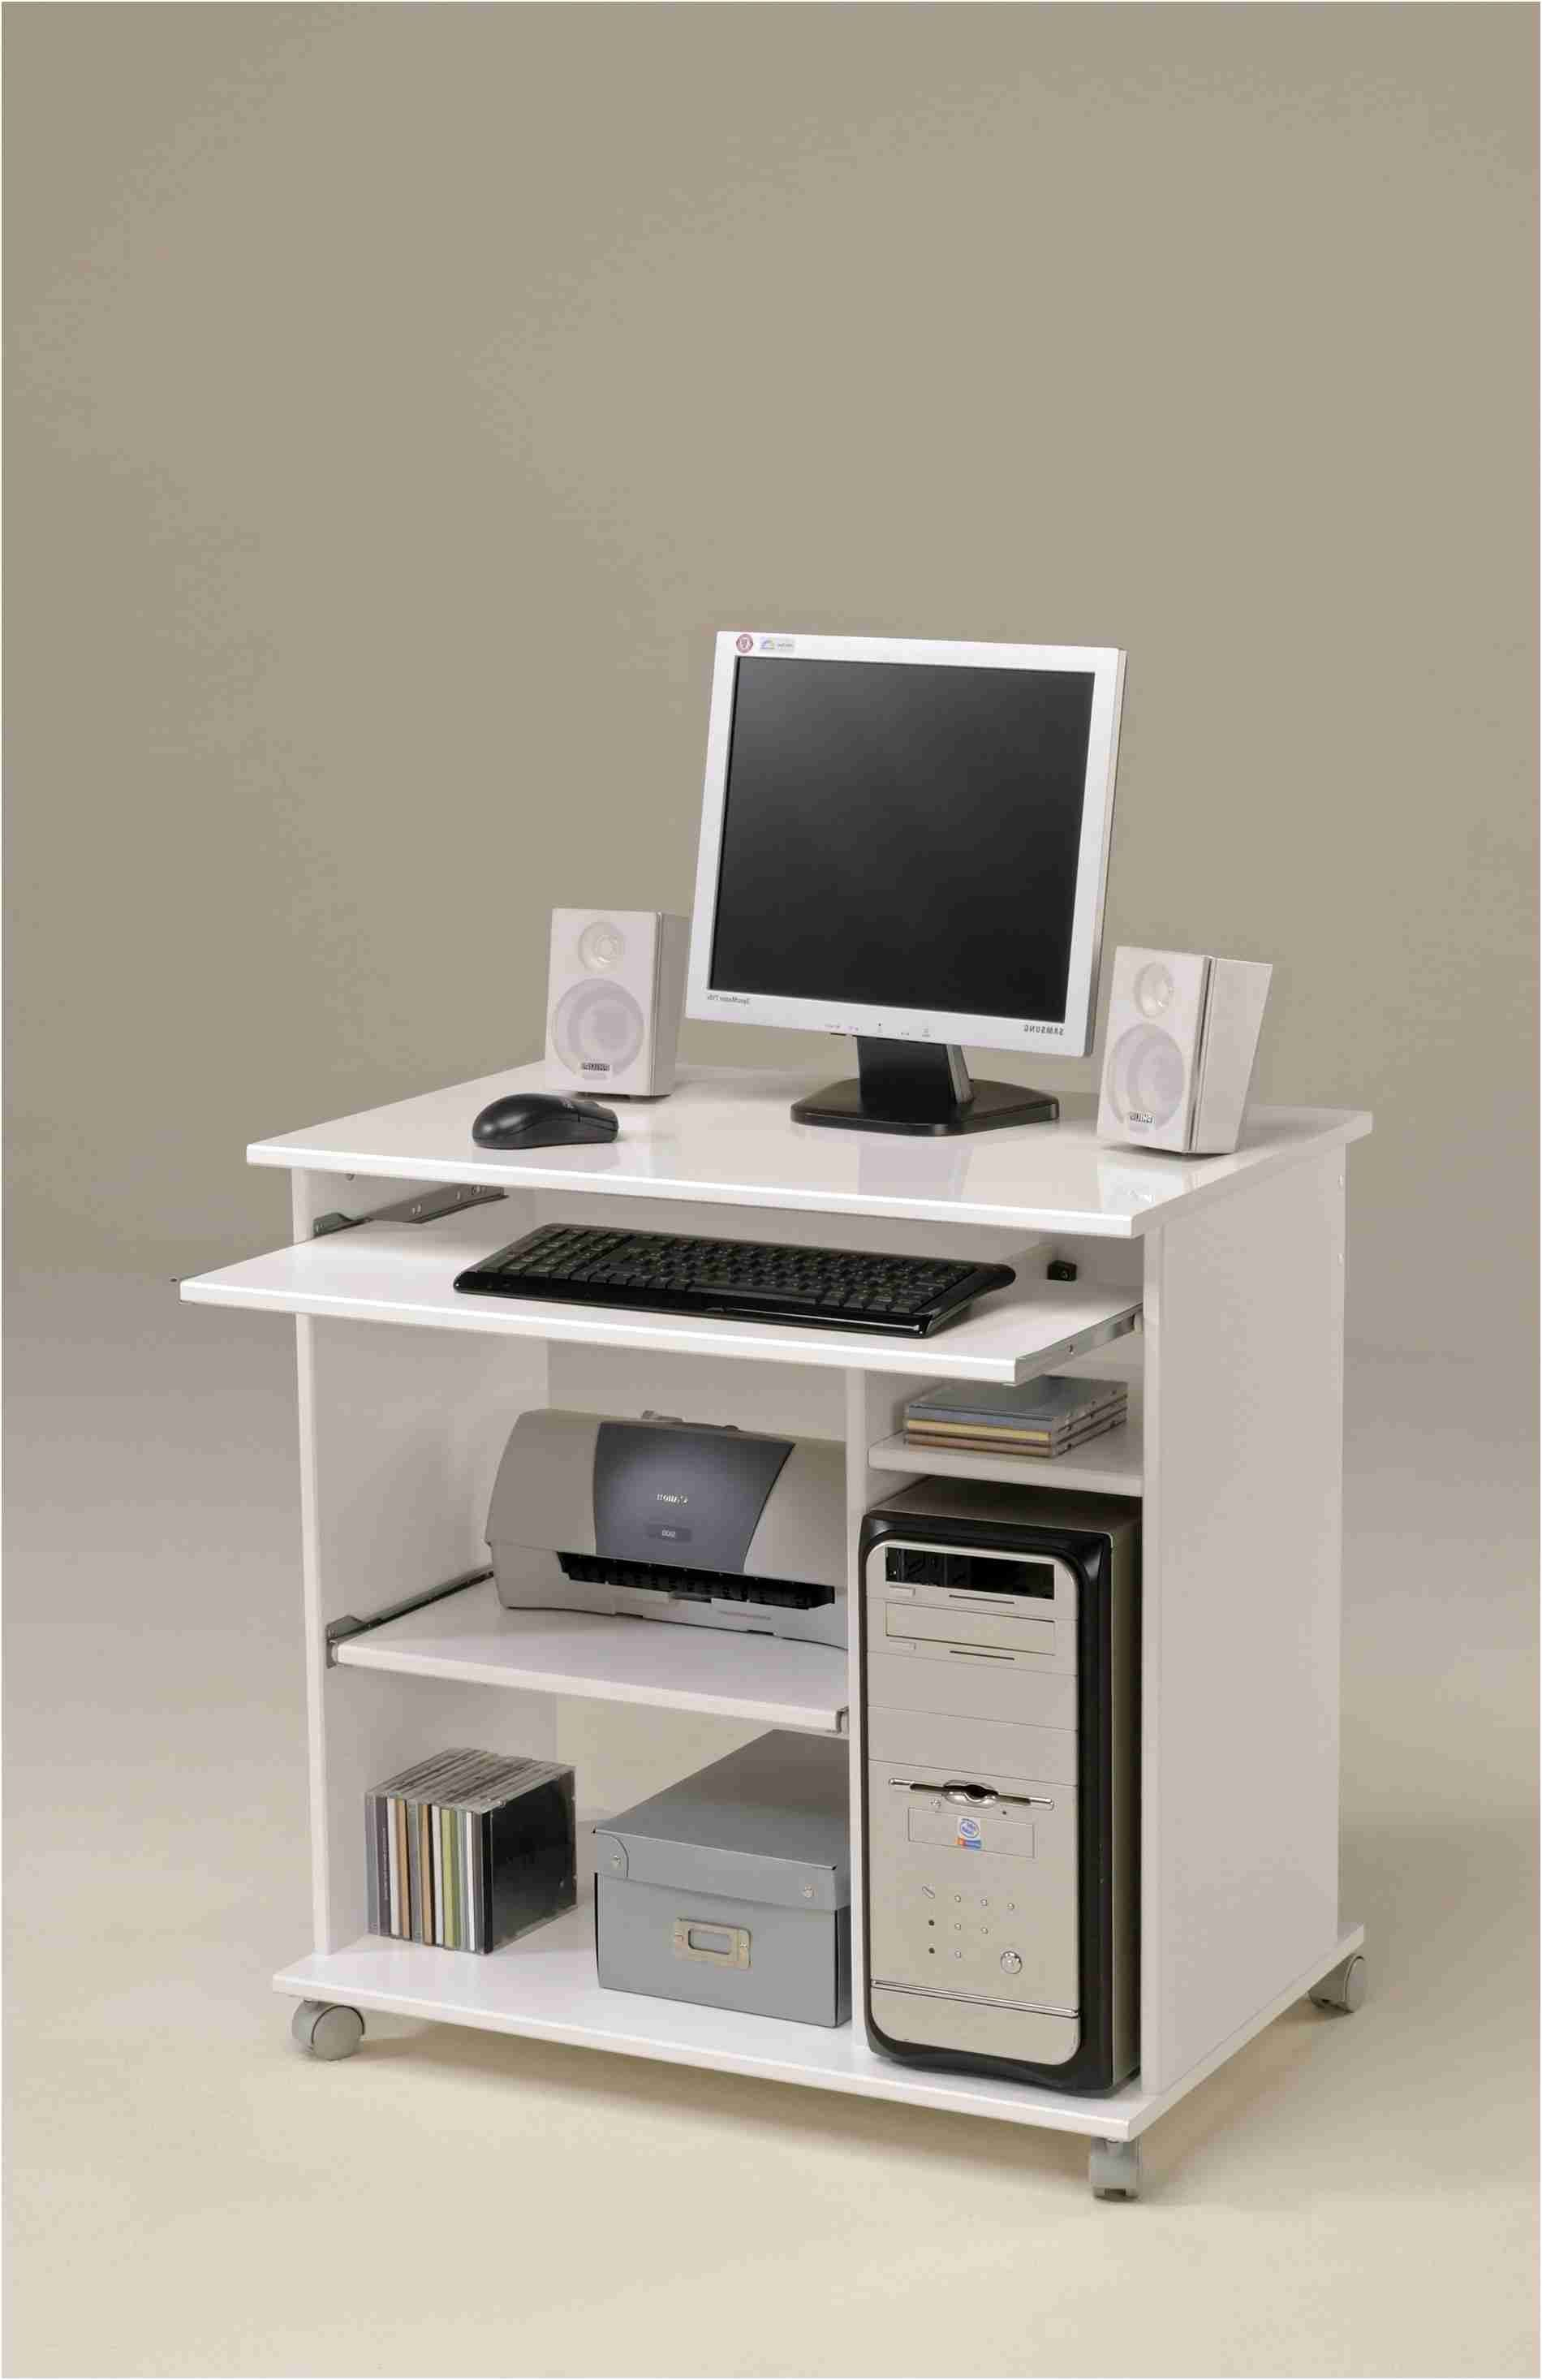 23 Fabuleux Meuble Imprimante Design Desk Furniture